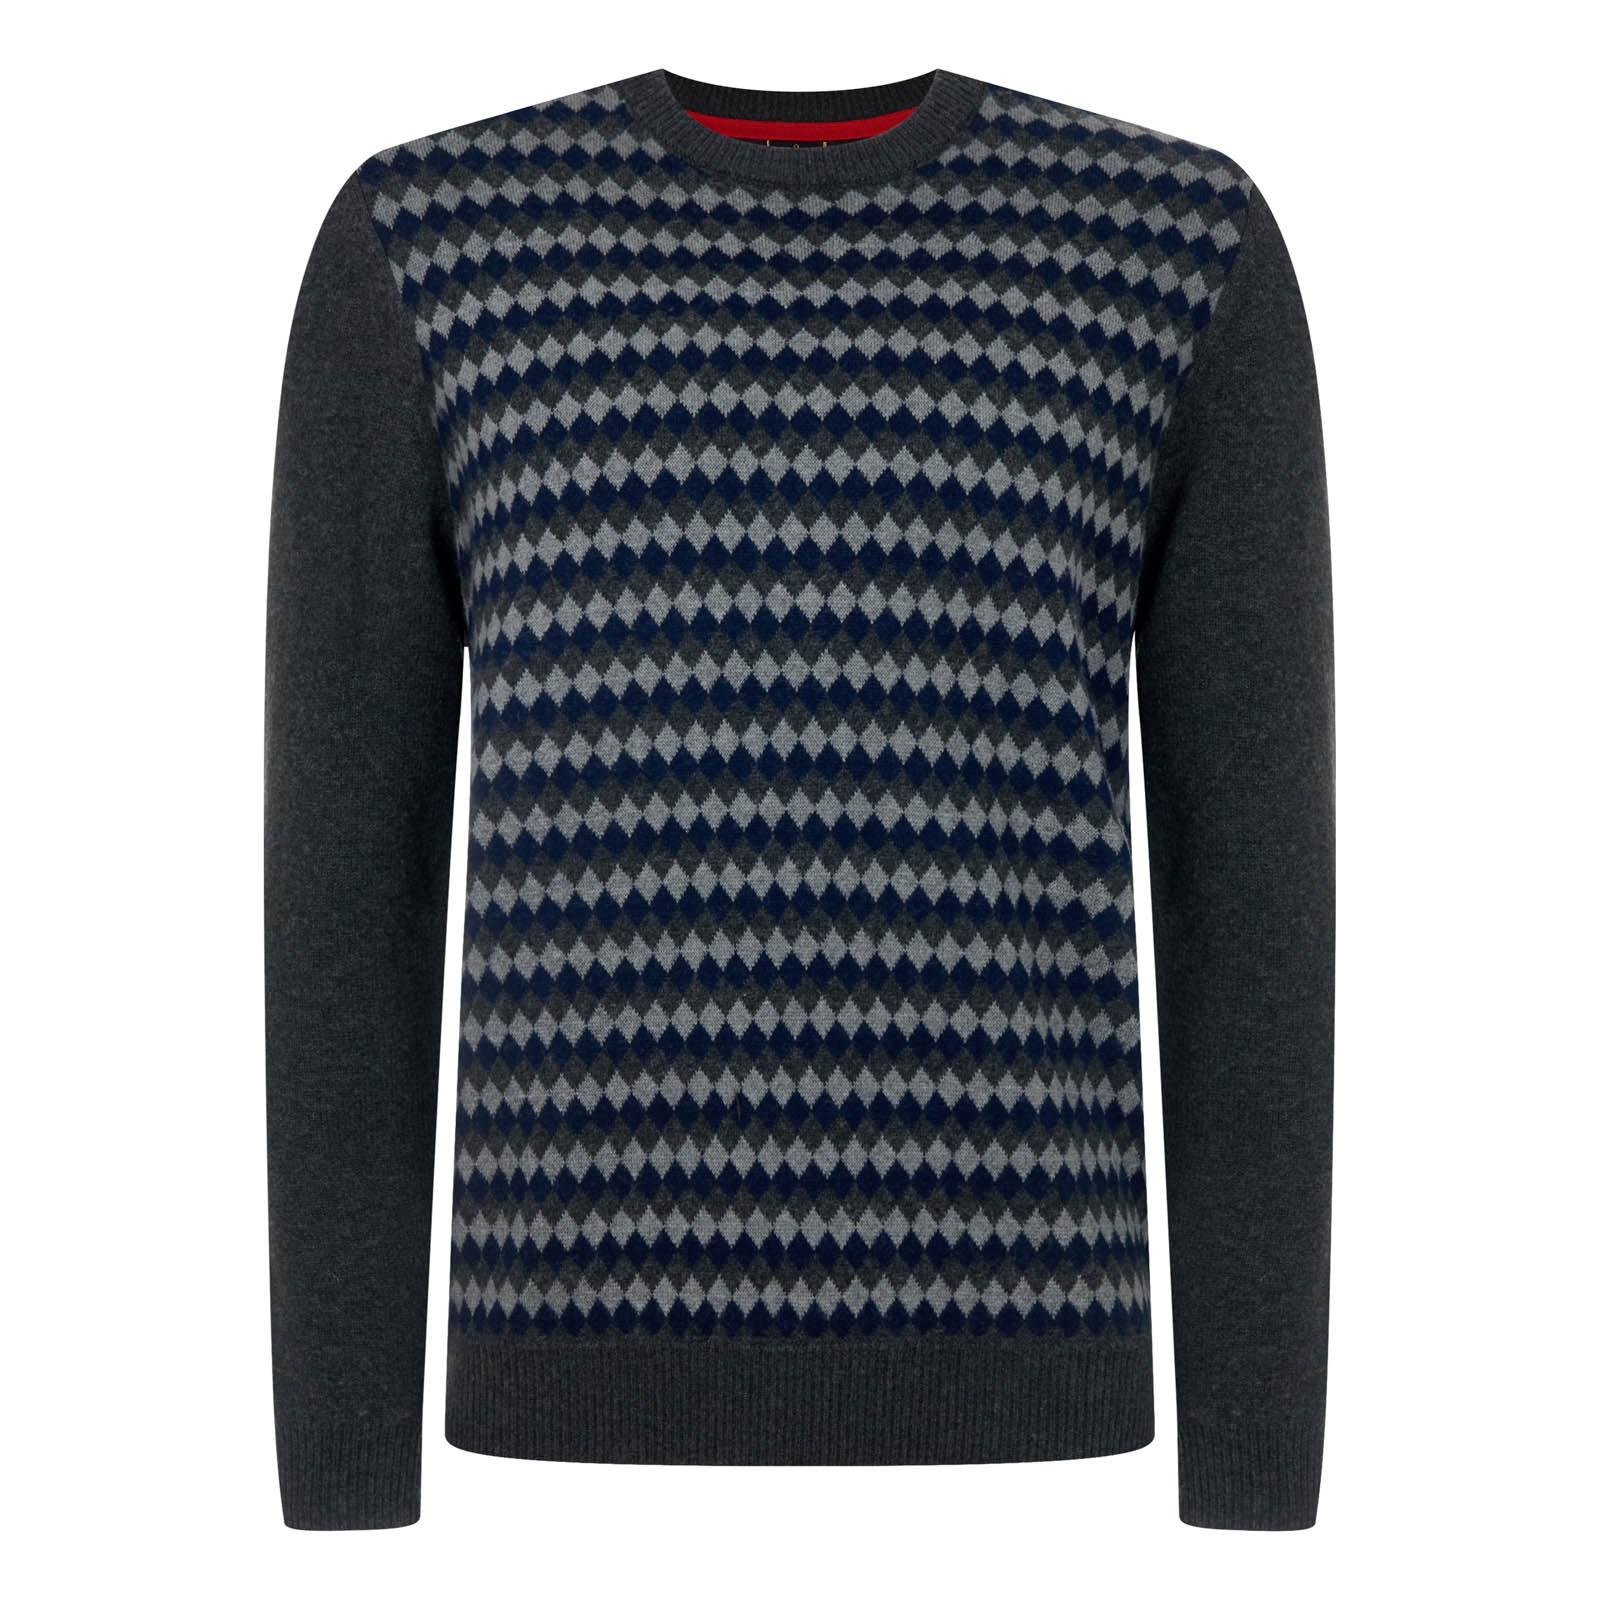 Sweter  MERC LONDON ROXBY szary